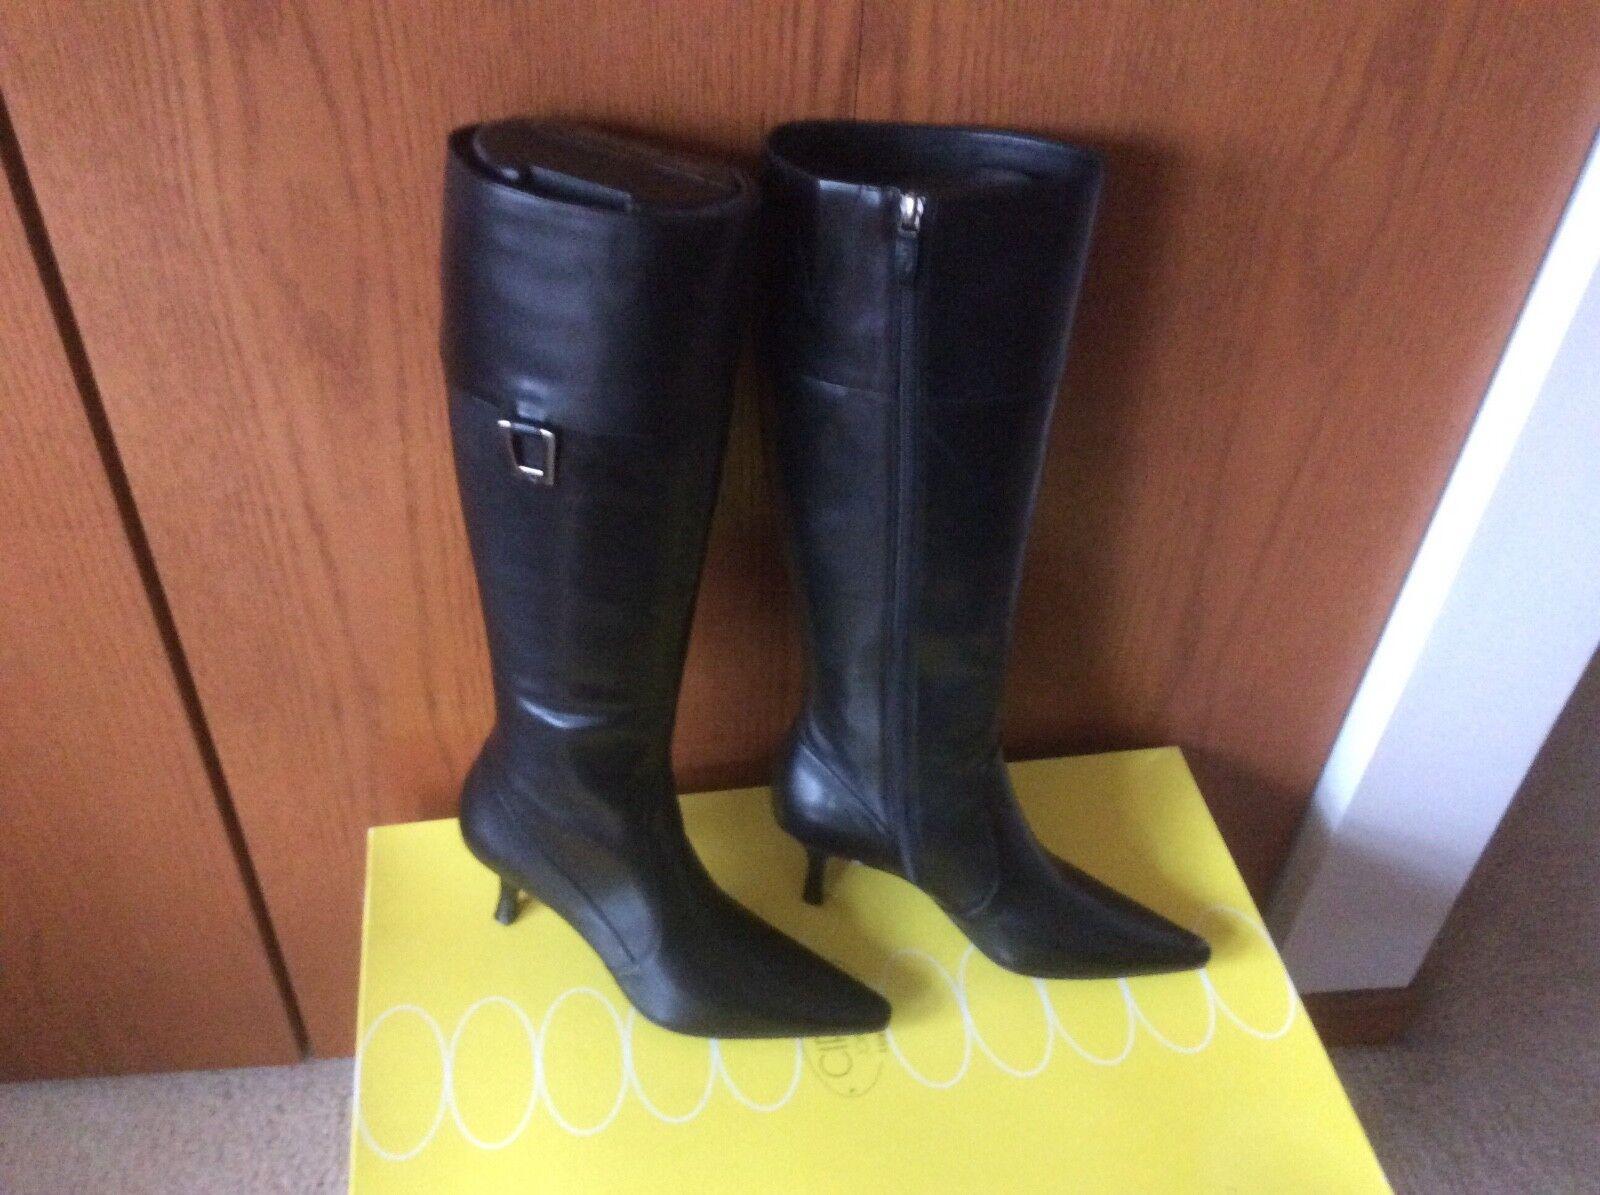 CIRCA JOAN & DAVID  luxe series woman's knee high boots 8 N , $250.00